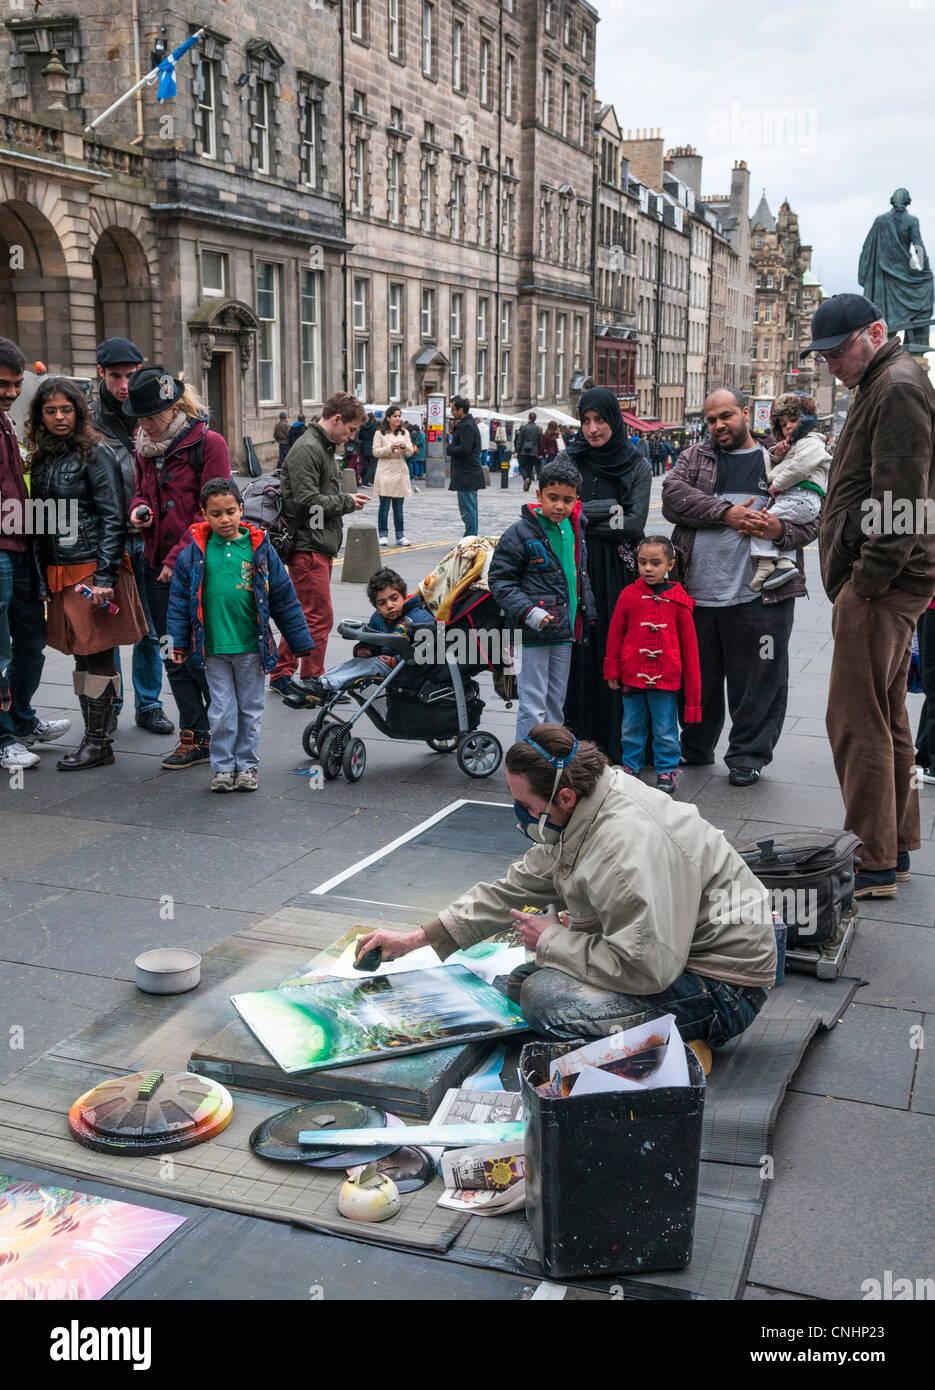 Pavement artist on the Royal Mile, Edinburgh - Stock Image